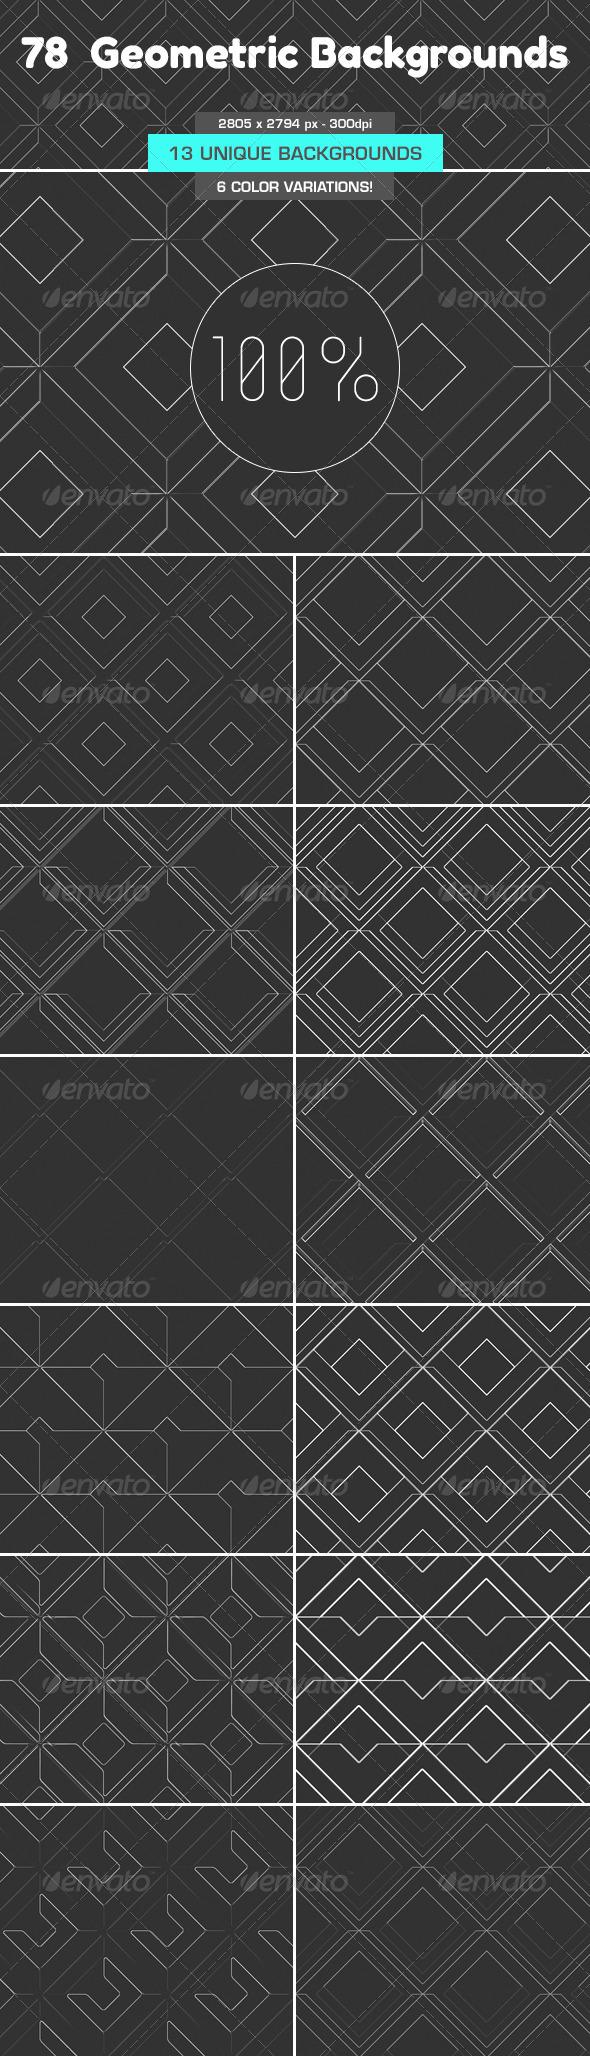 78 Geometric Backgrounds